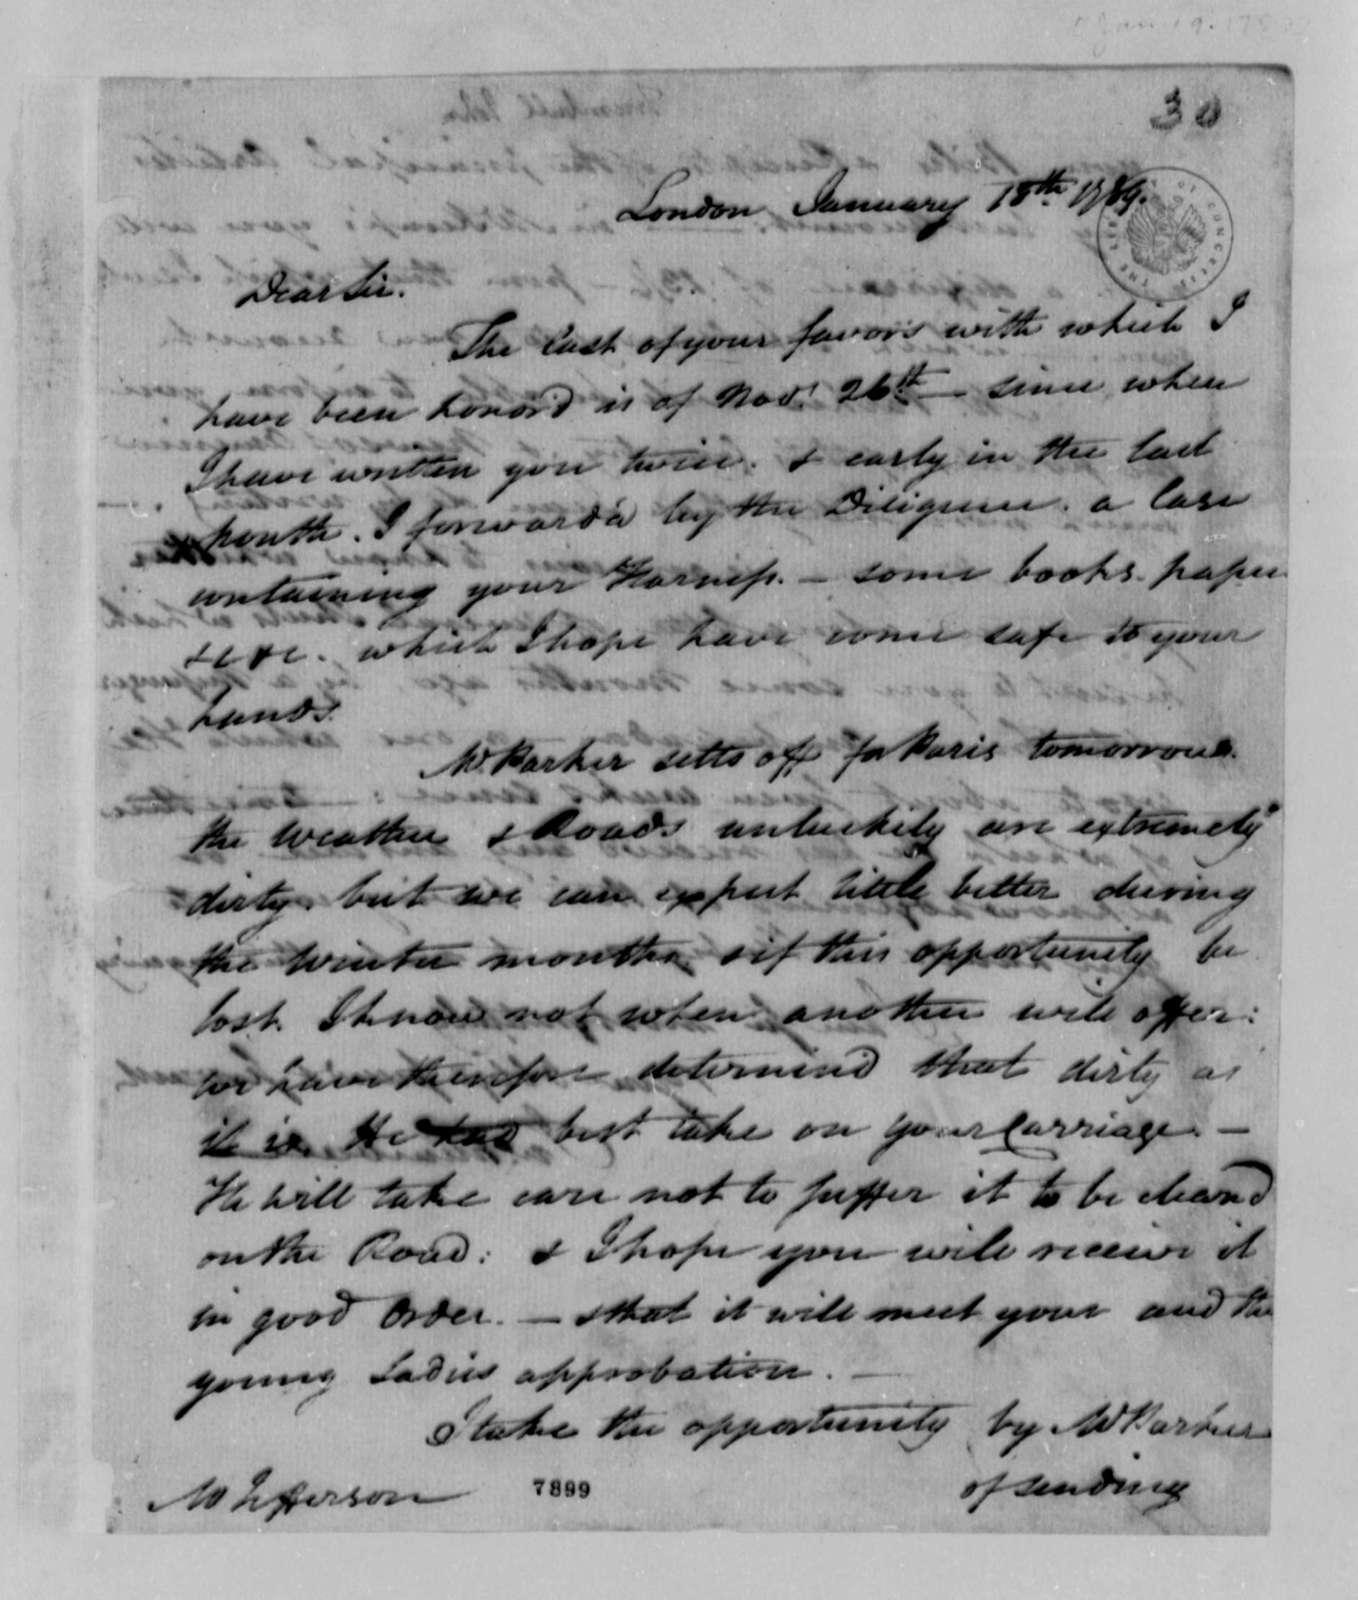 John Trumbull to Thomas Jefferson, January 18, 1789